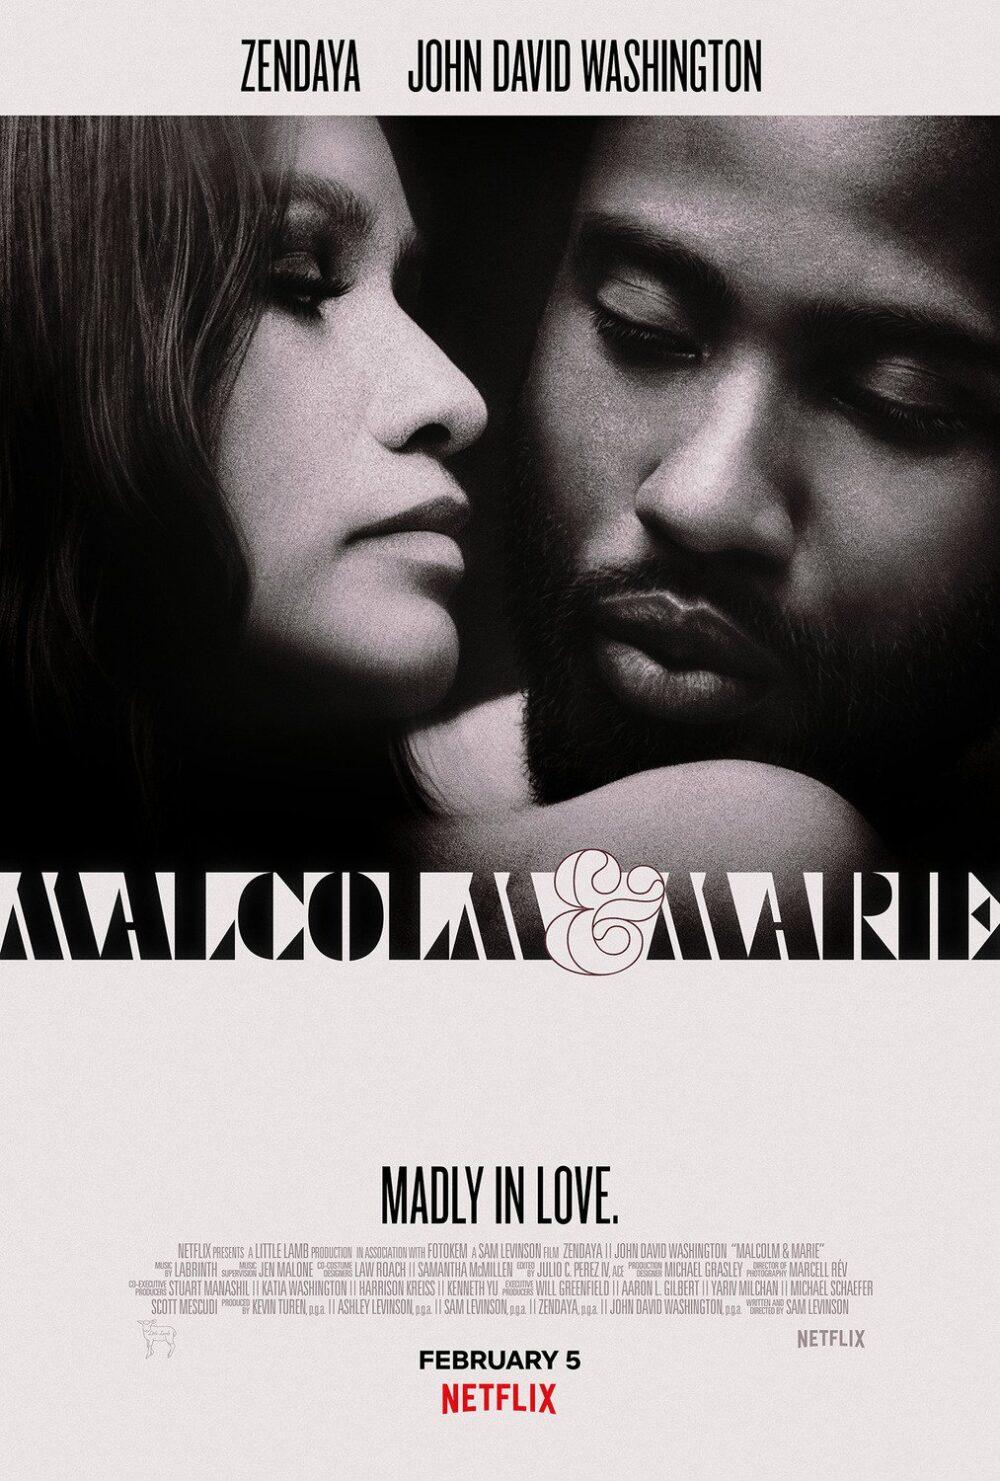 malcolm-amp-marie-trailer-italiano-del-film-netflix-con-zendaya-e-john-david-washington